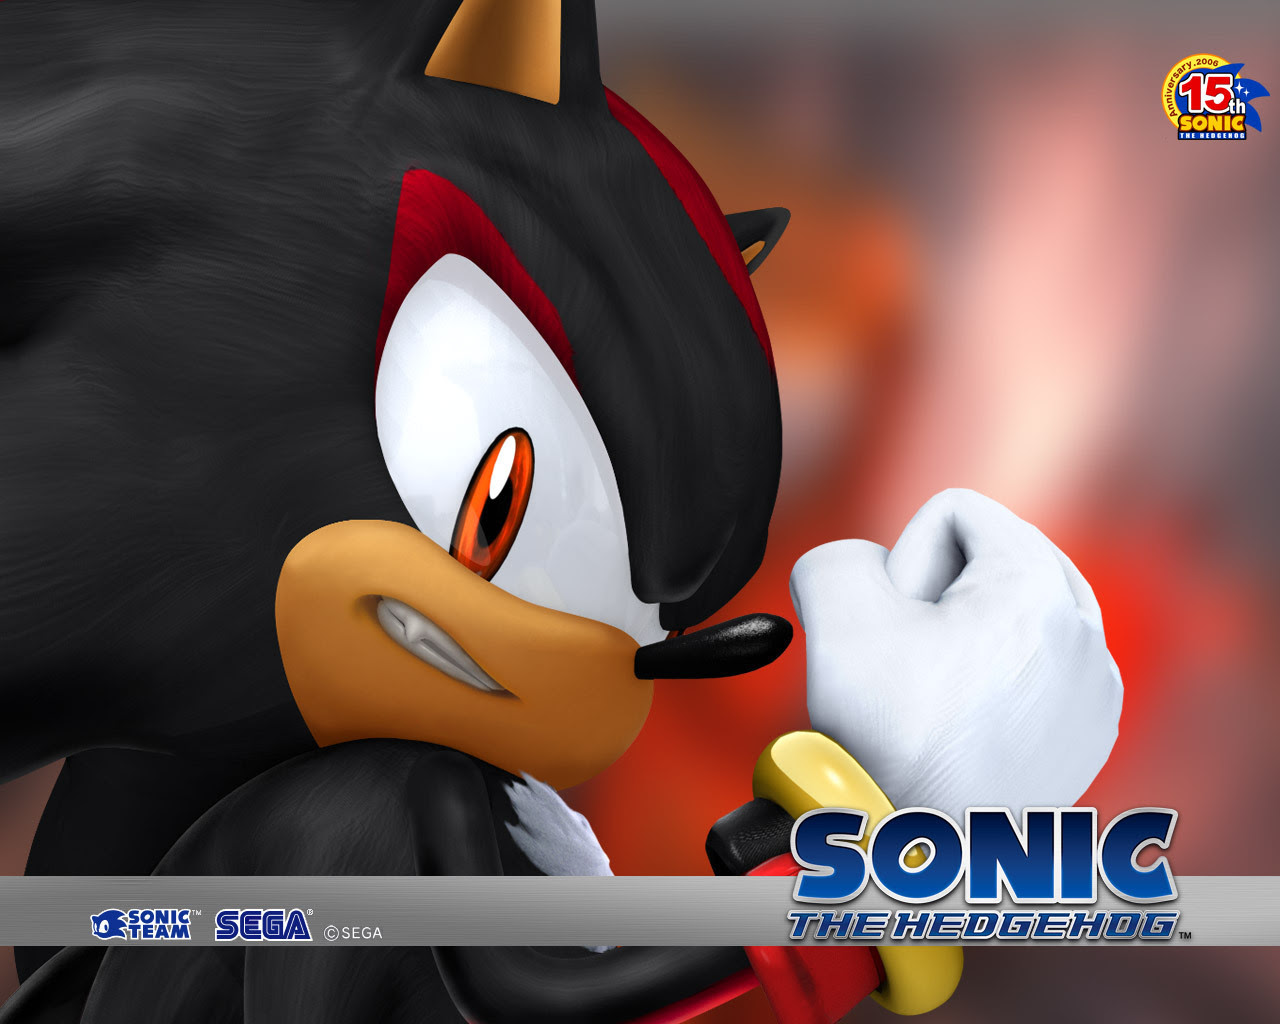 Shadow The Hedgehog シャドウ ザ ヘッジホッグ 壁紙 10005584